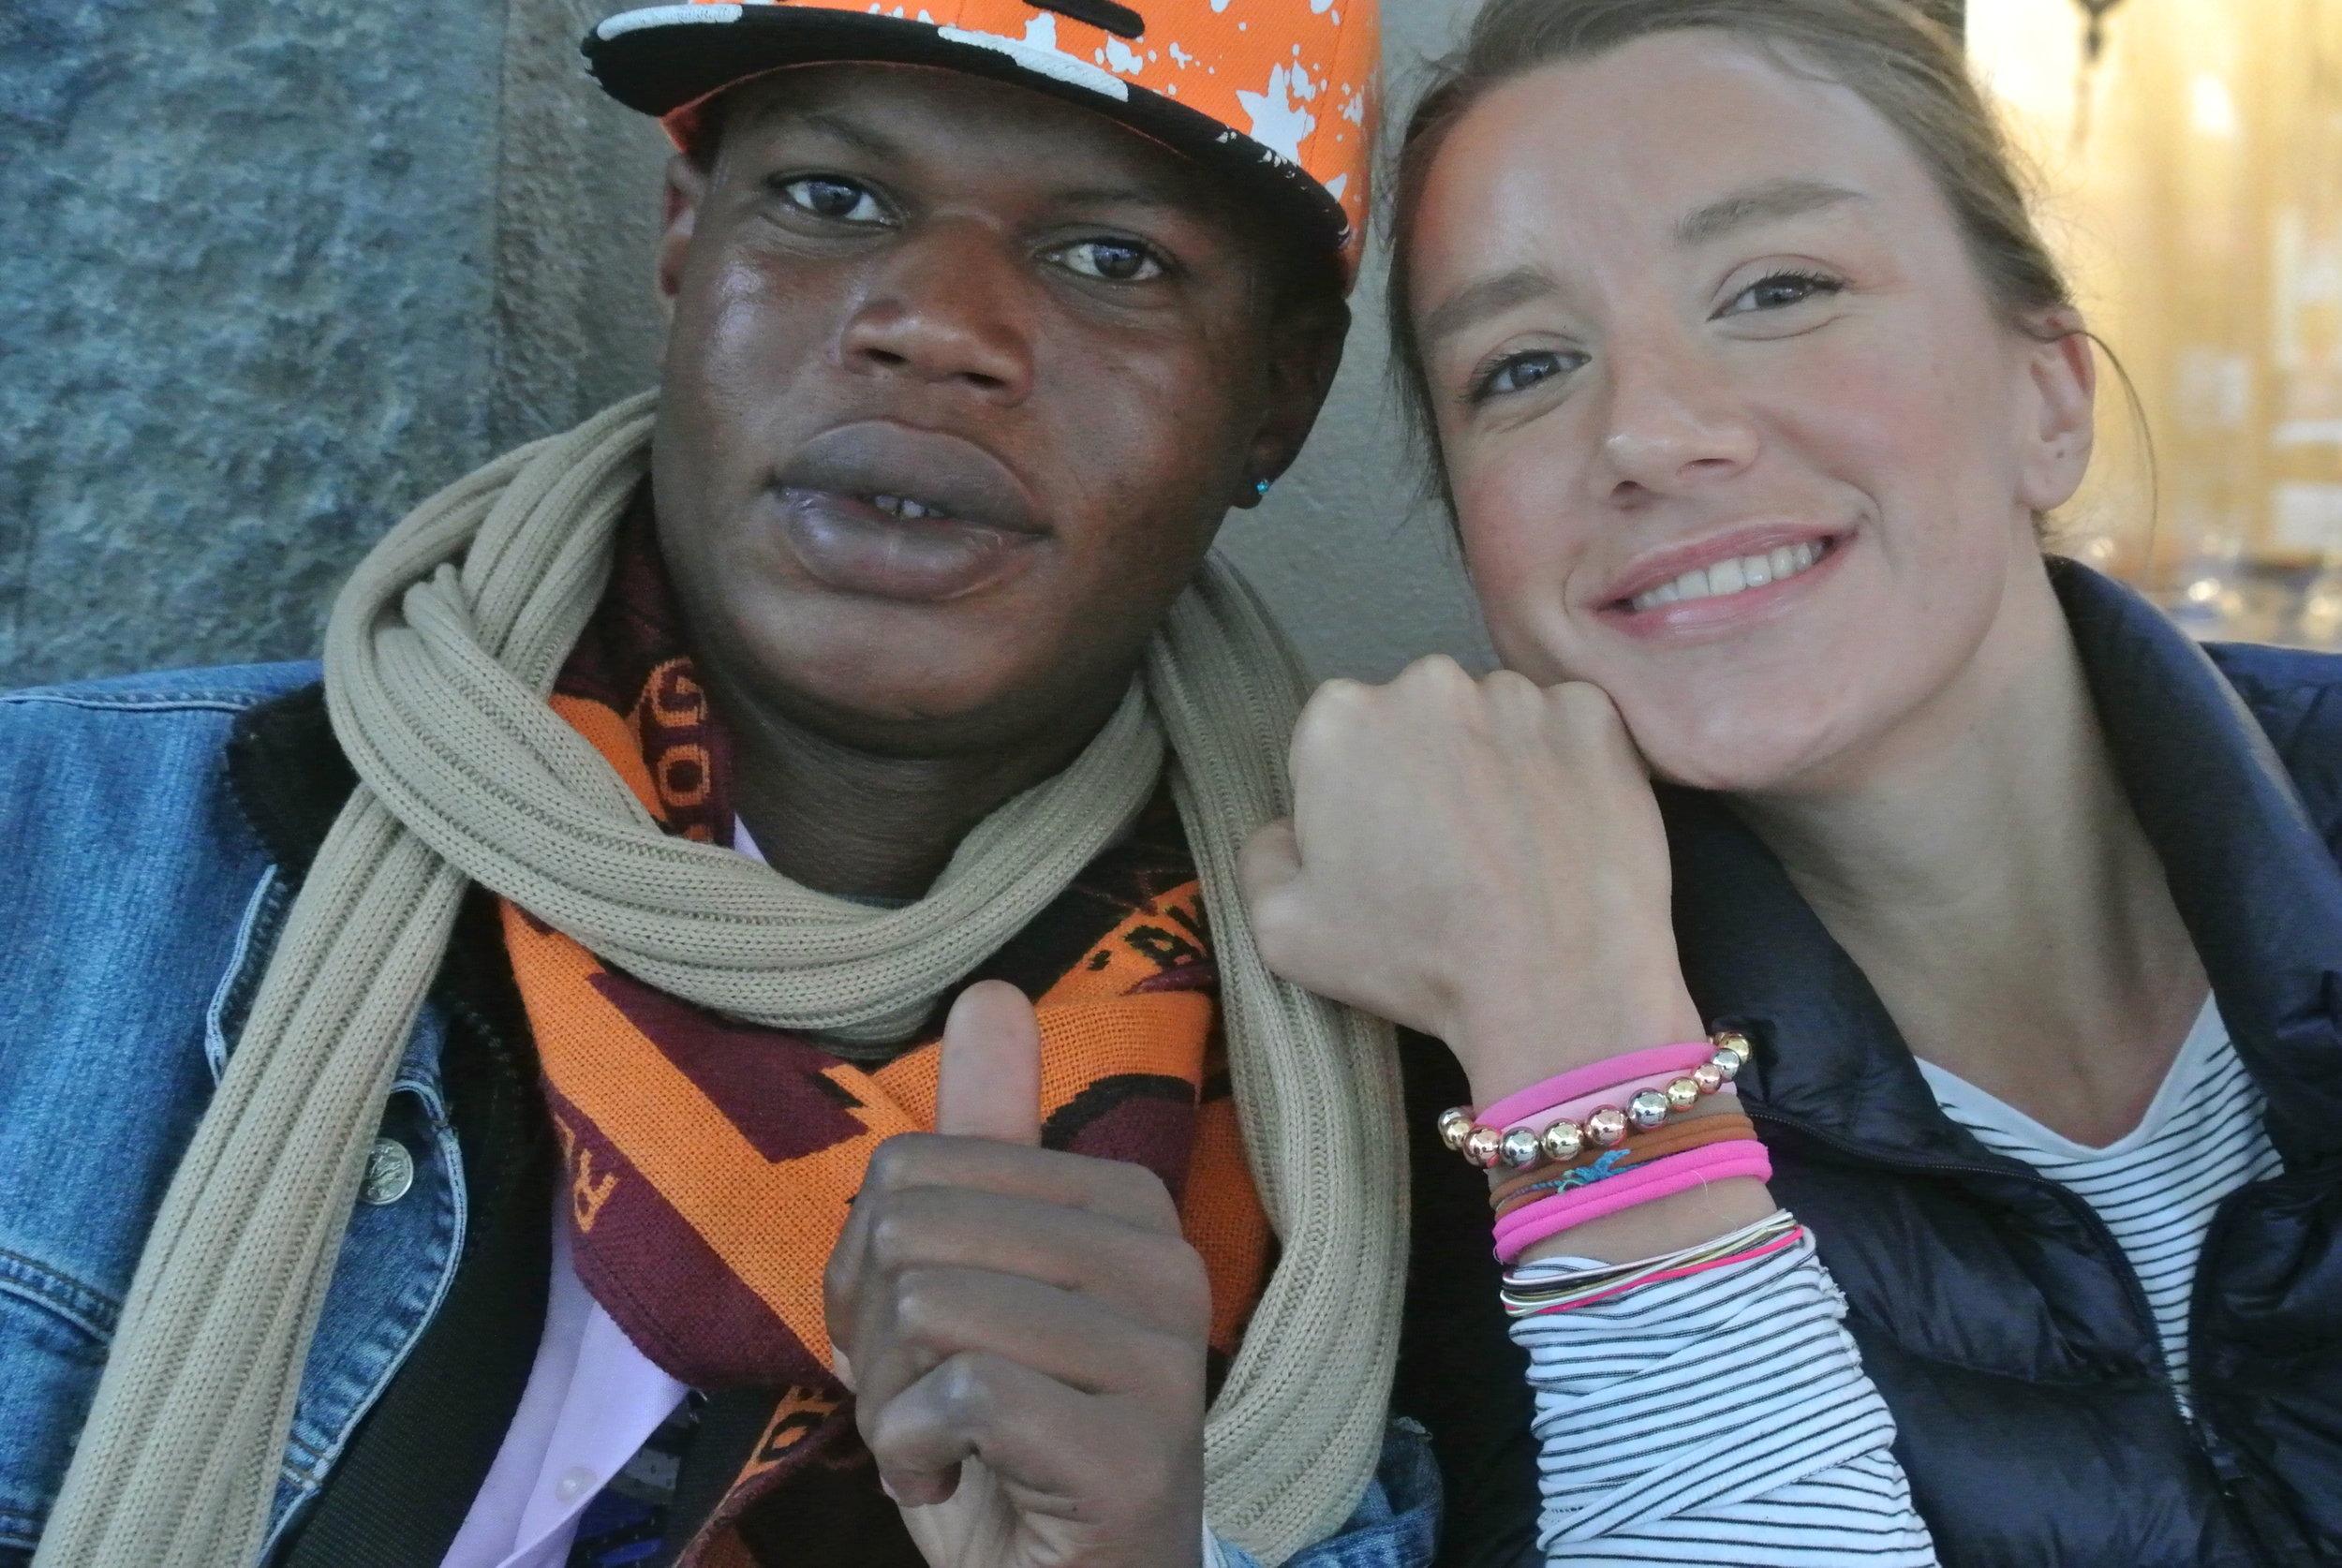 Yoro and the author wearing her friendship bracelet; Ousman, the photographer. In Napoli, November 2017. © Pamela Kerpius